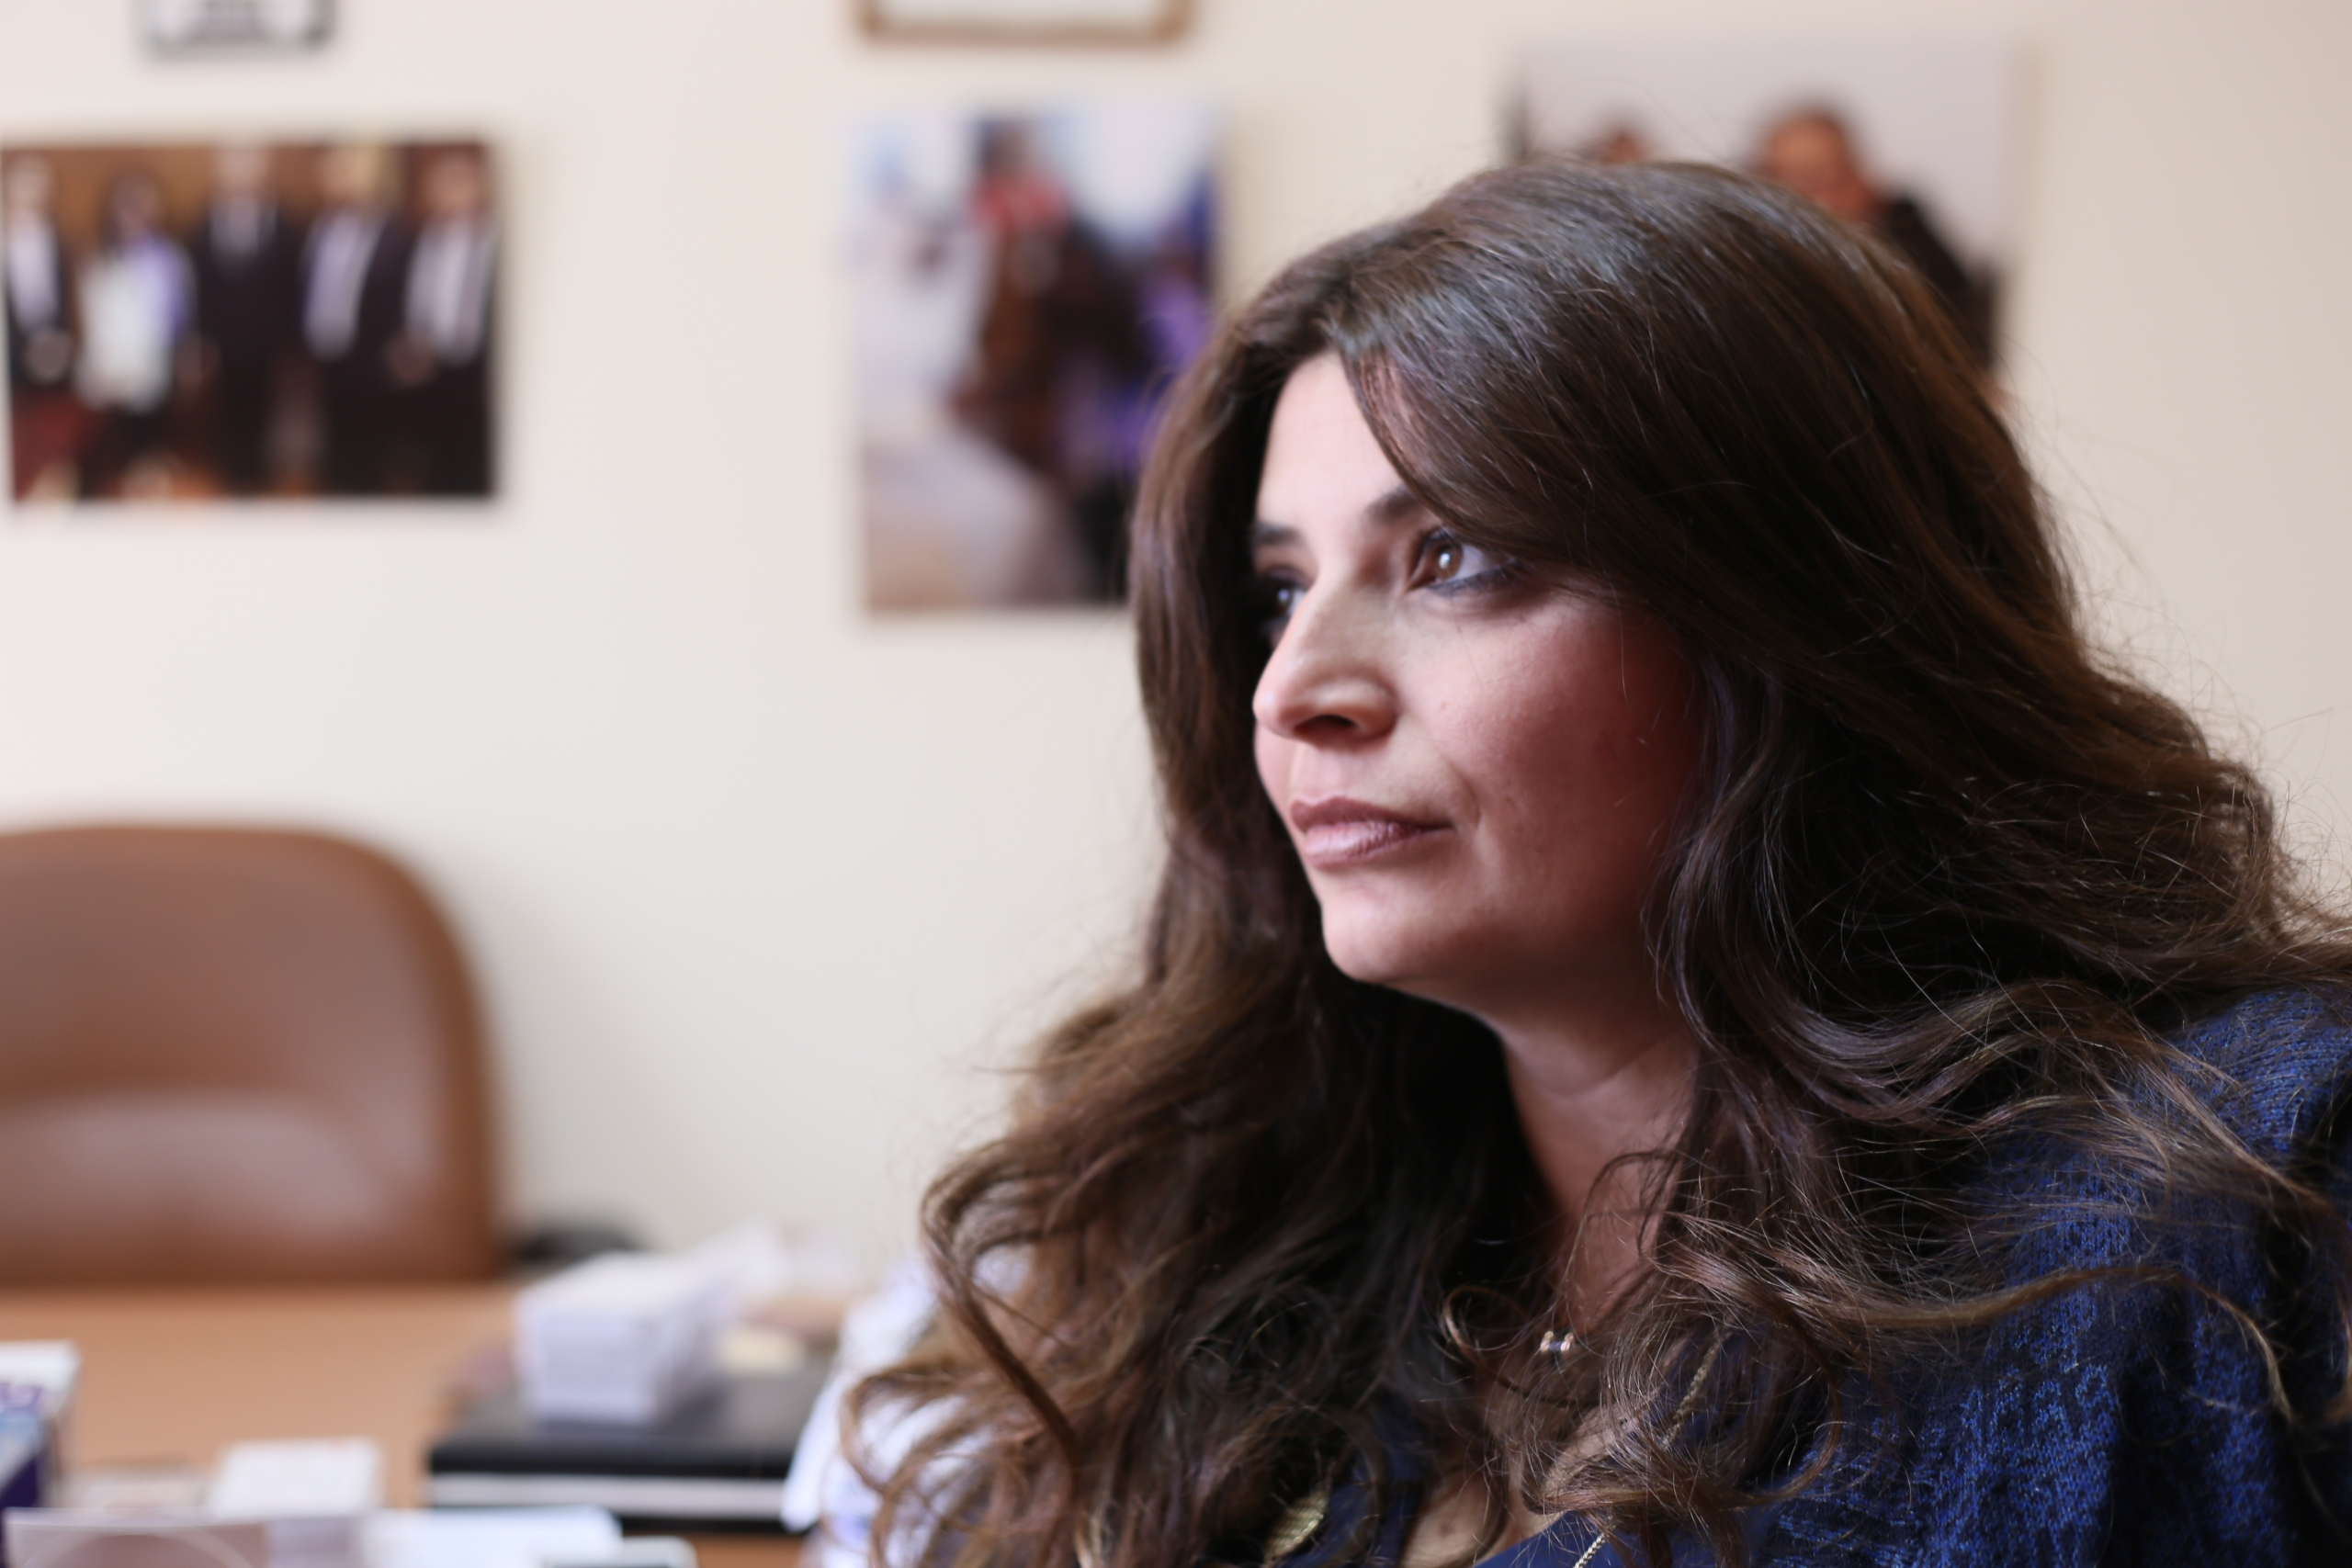 LAMIA KAMEL: THE ACHIEVEMENT OF SUSTAINABLE DEVELOPMENT IS LINKED TO THE DEVELOPMENT OF ENTREPRENEURSHIP